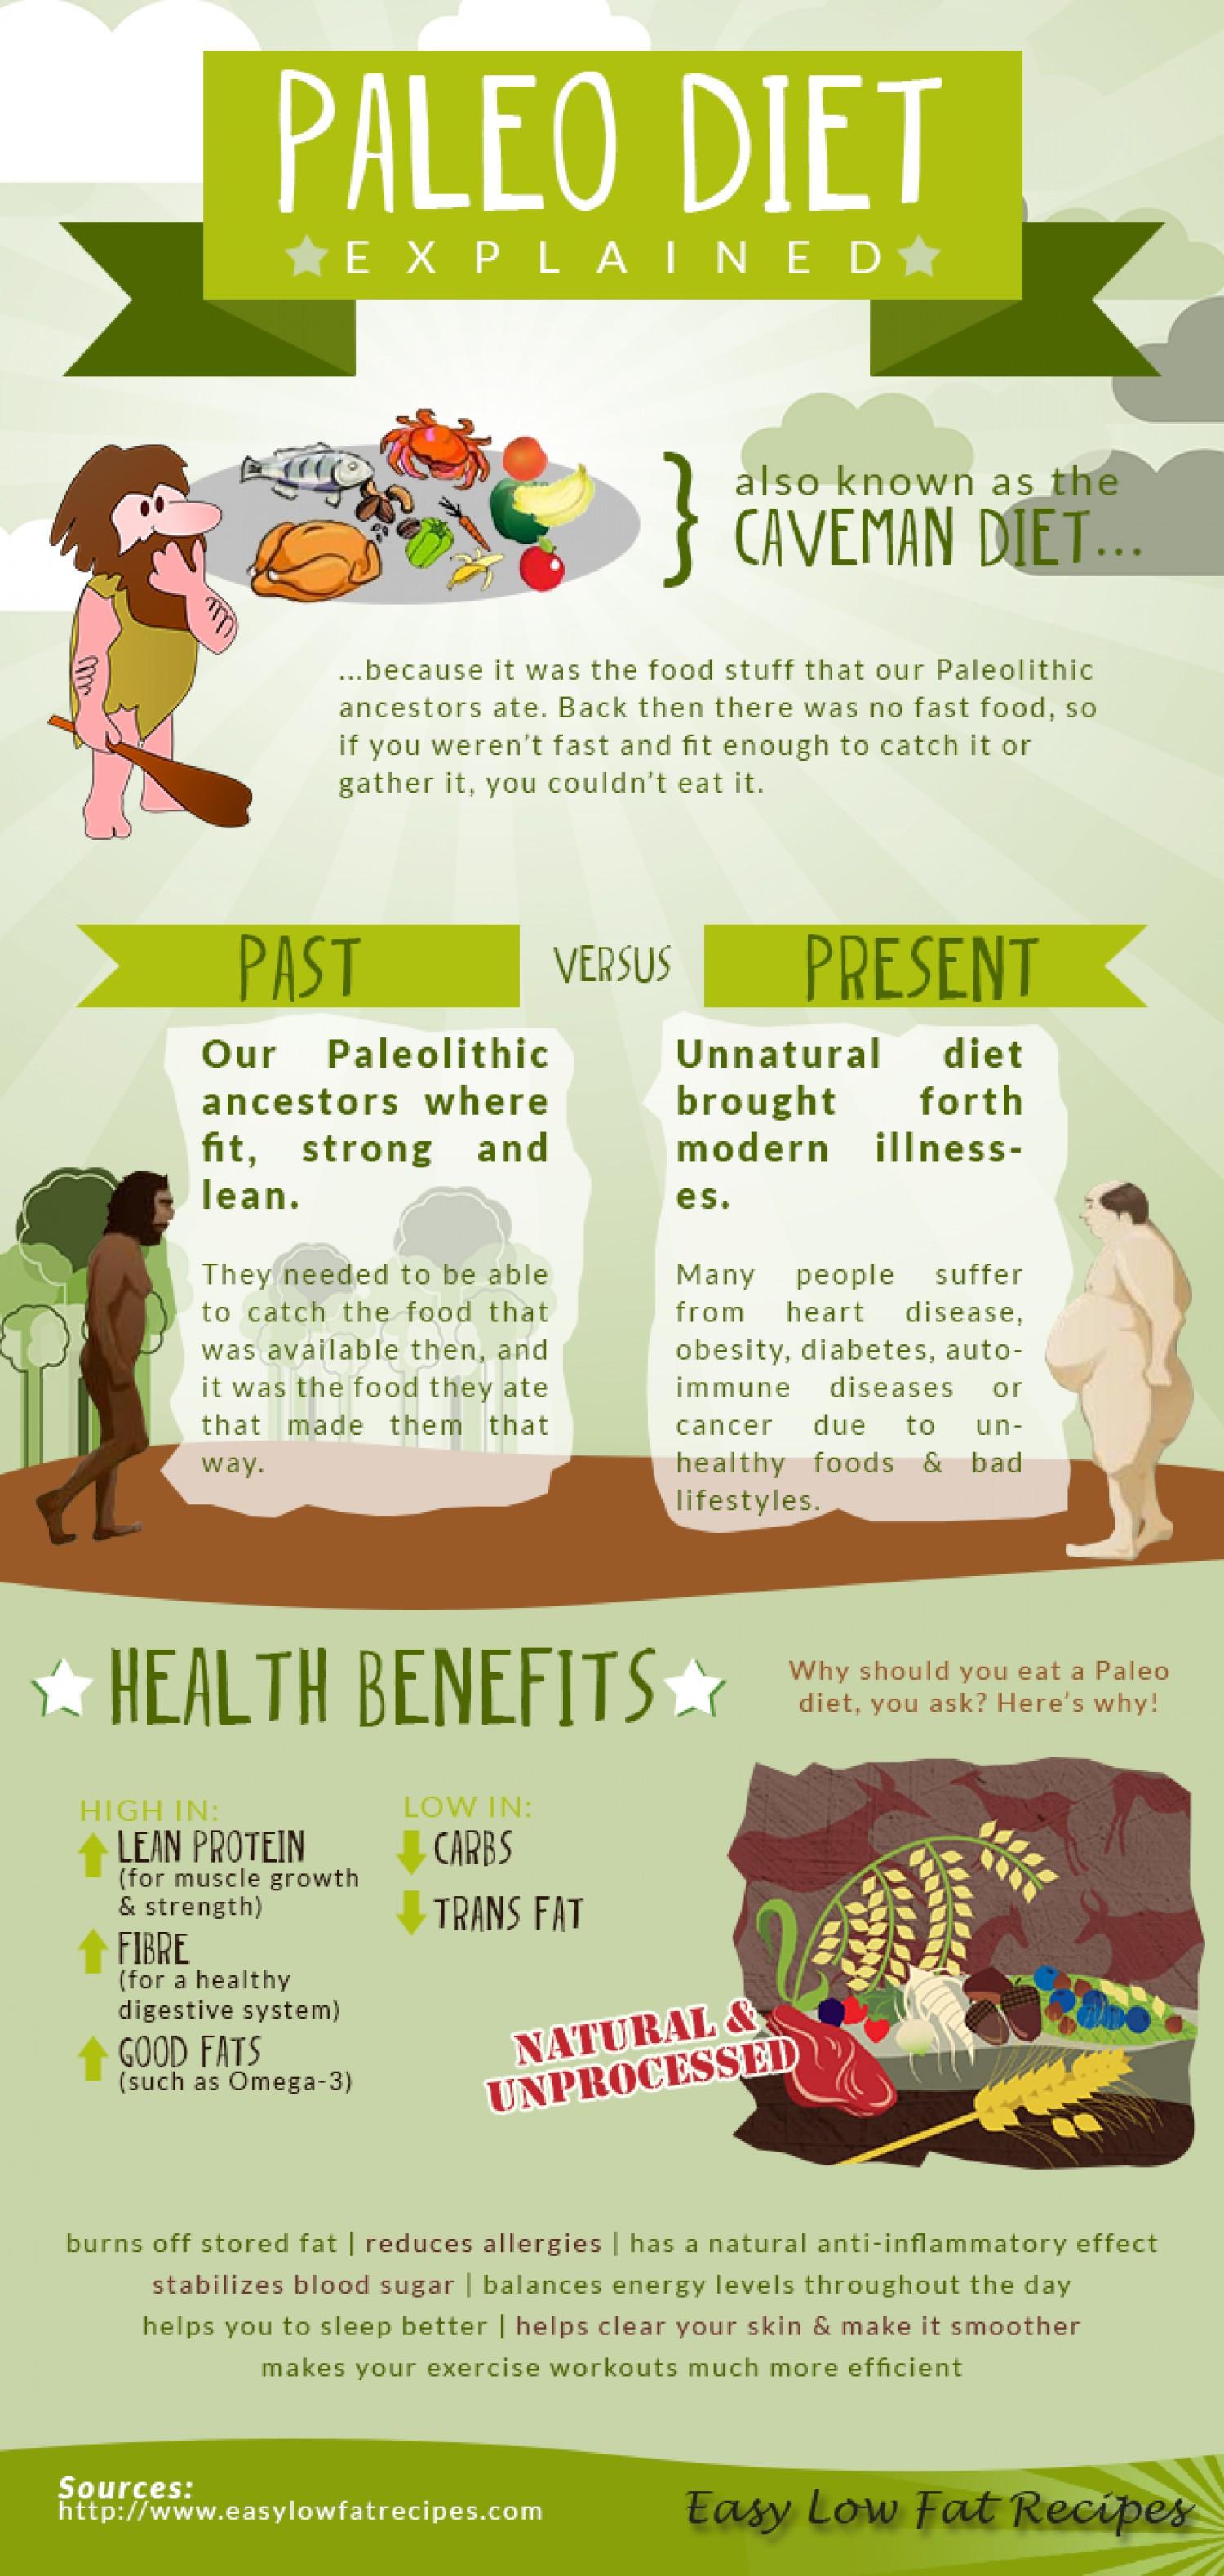 Is Paleo Diet Healthy  Paleo Diet Explained